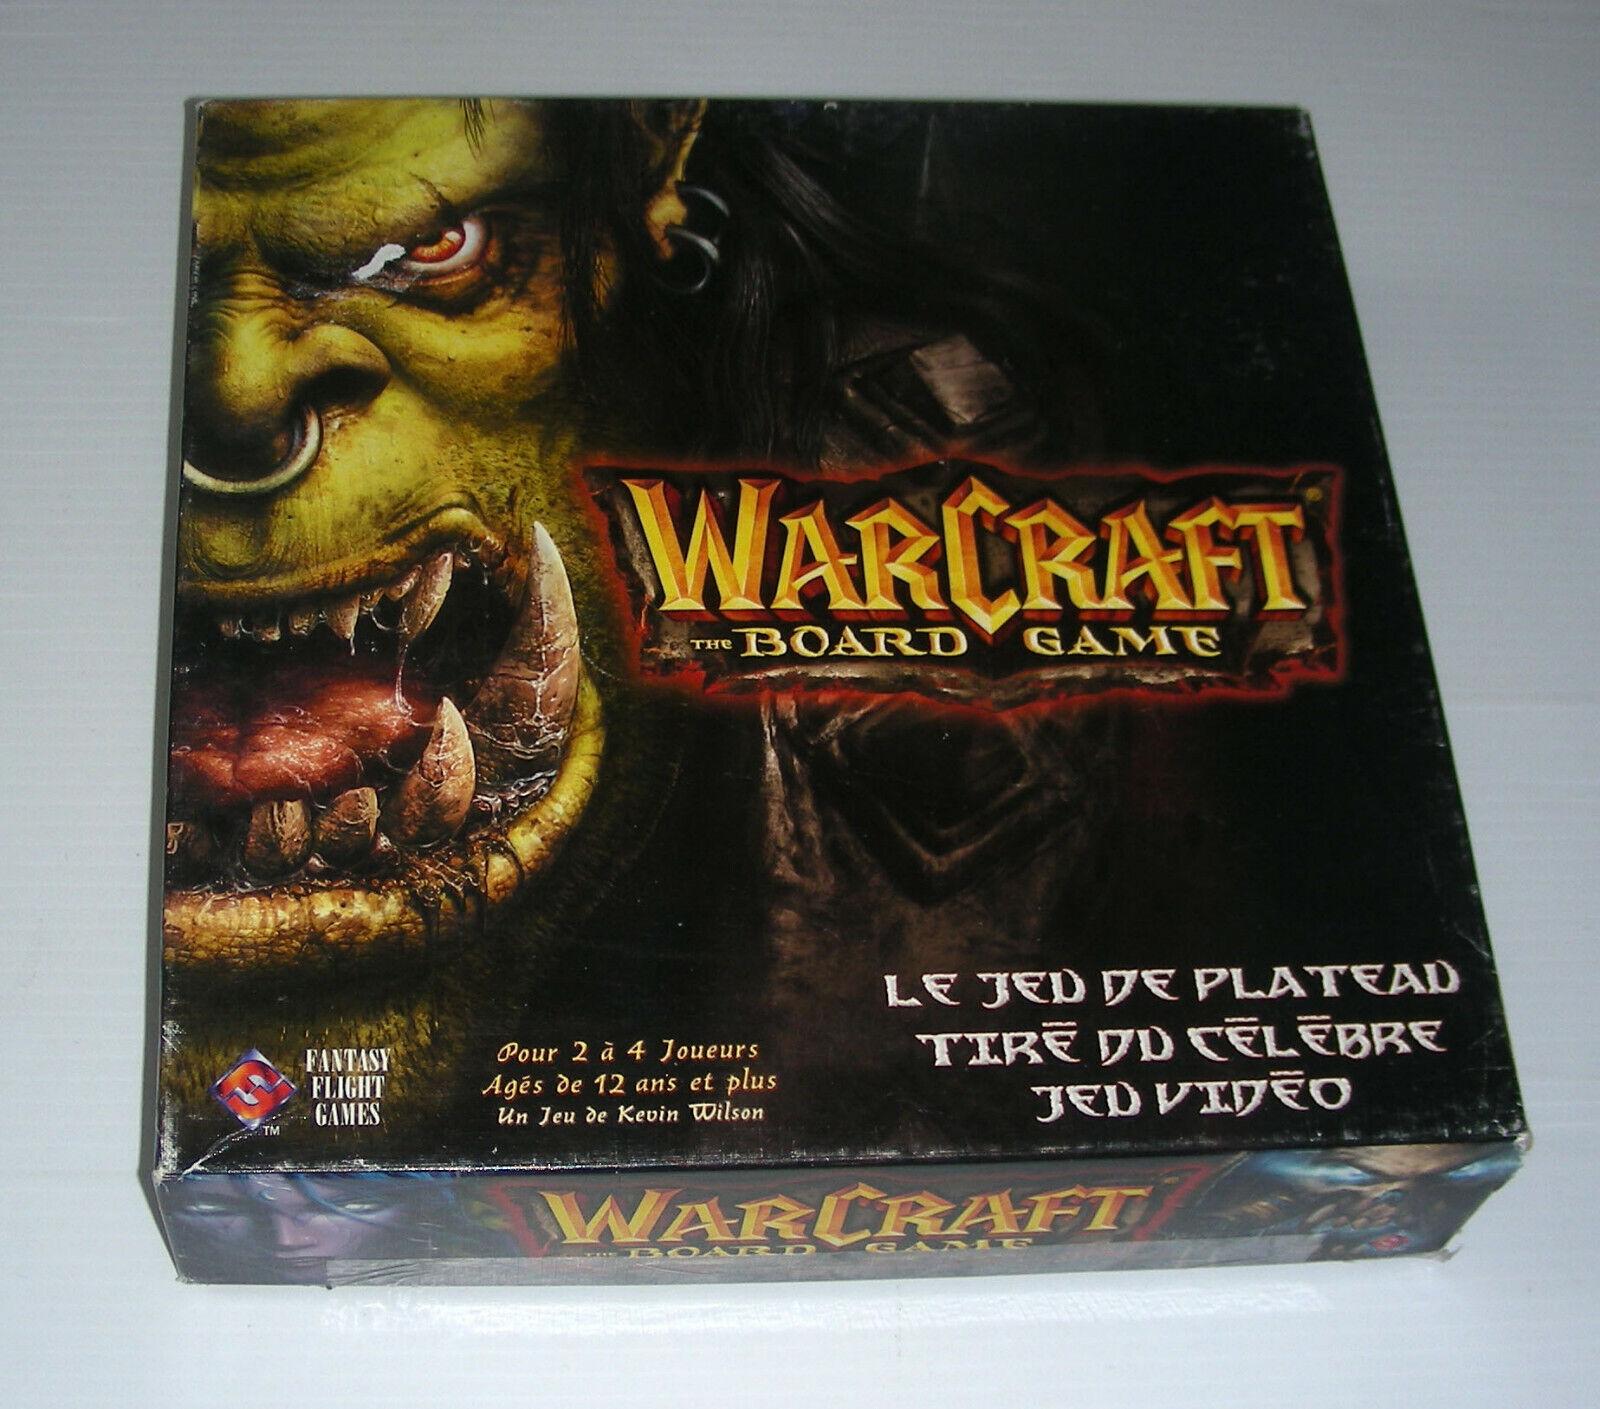 Warcraft Jeu de meseta Société juego de mesa francés Français vuelo de fantasía